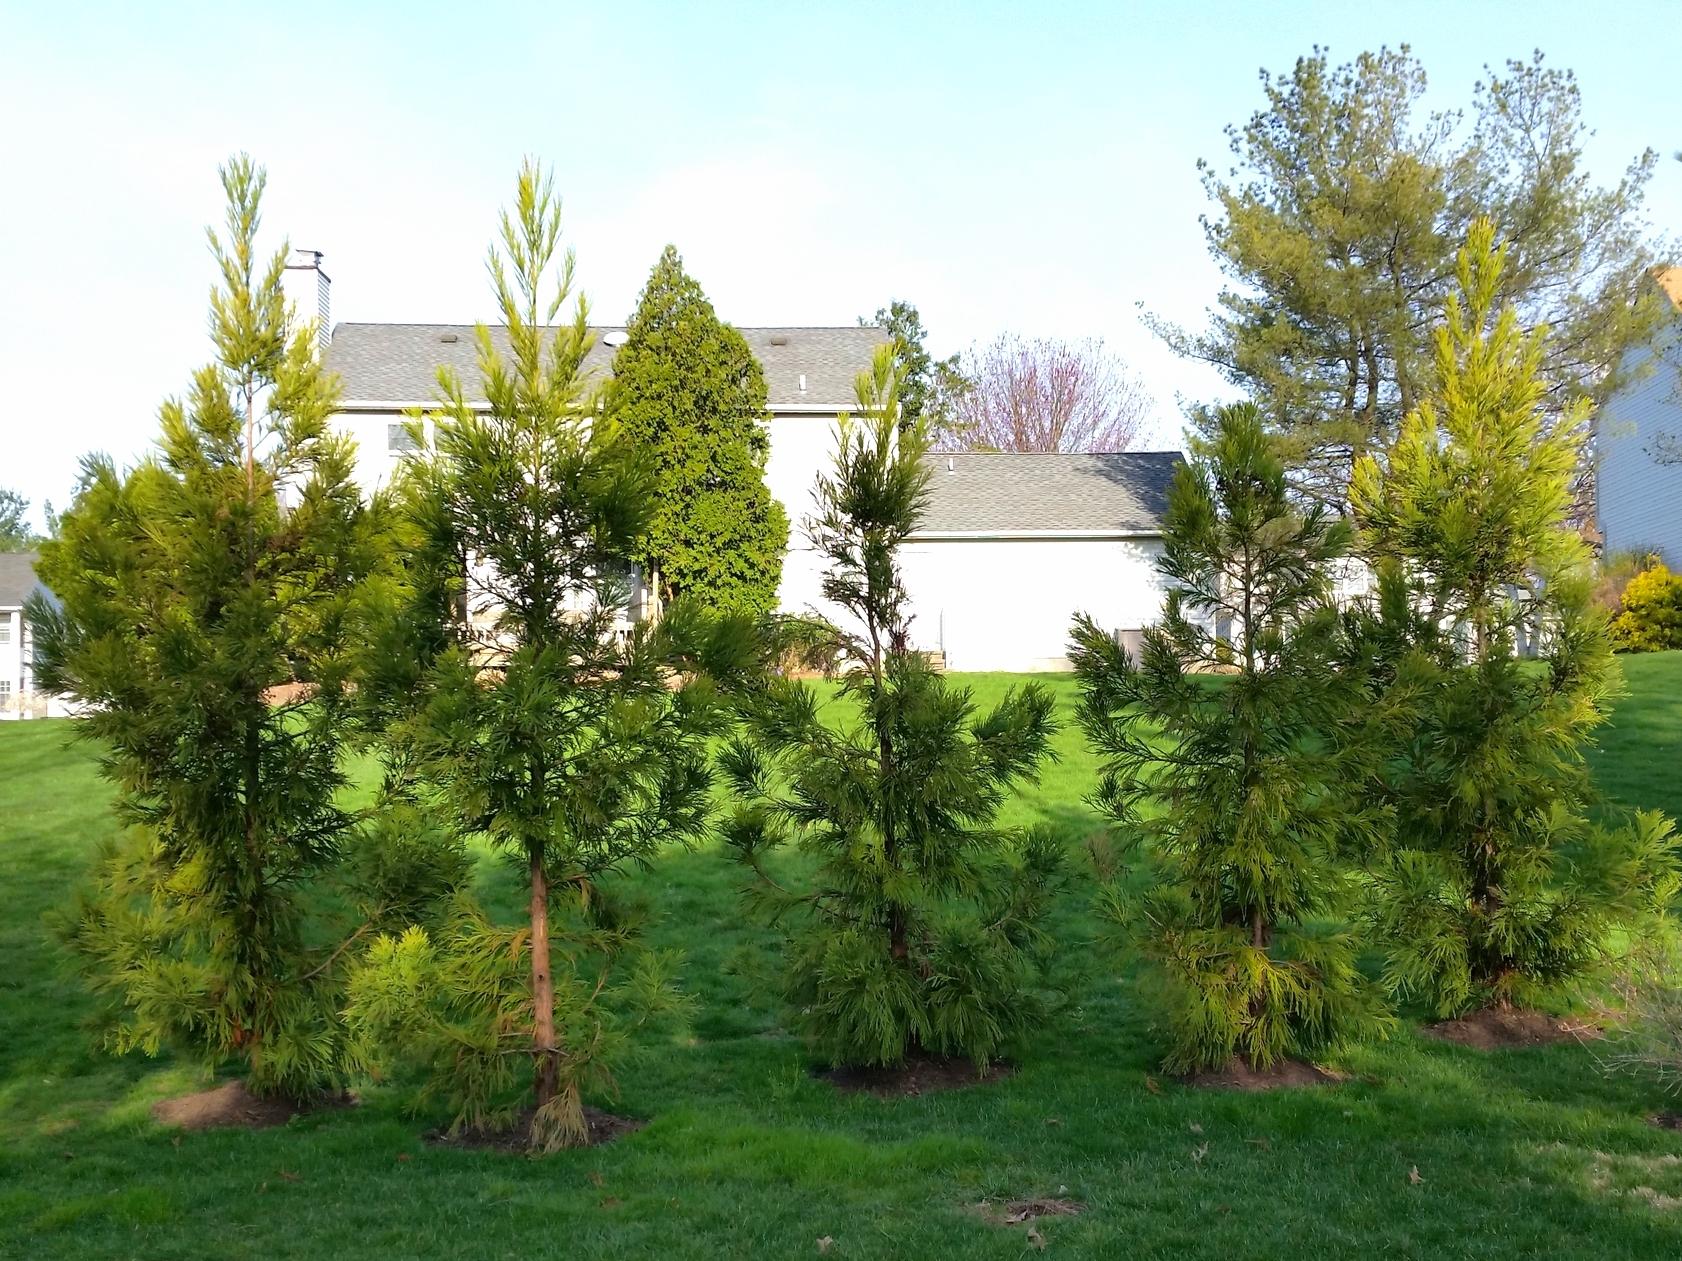 Pivacy, Buffer & Solar Energy Plantings